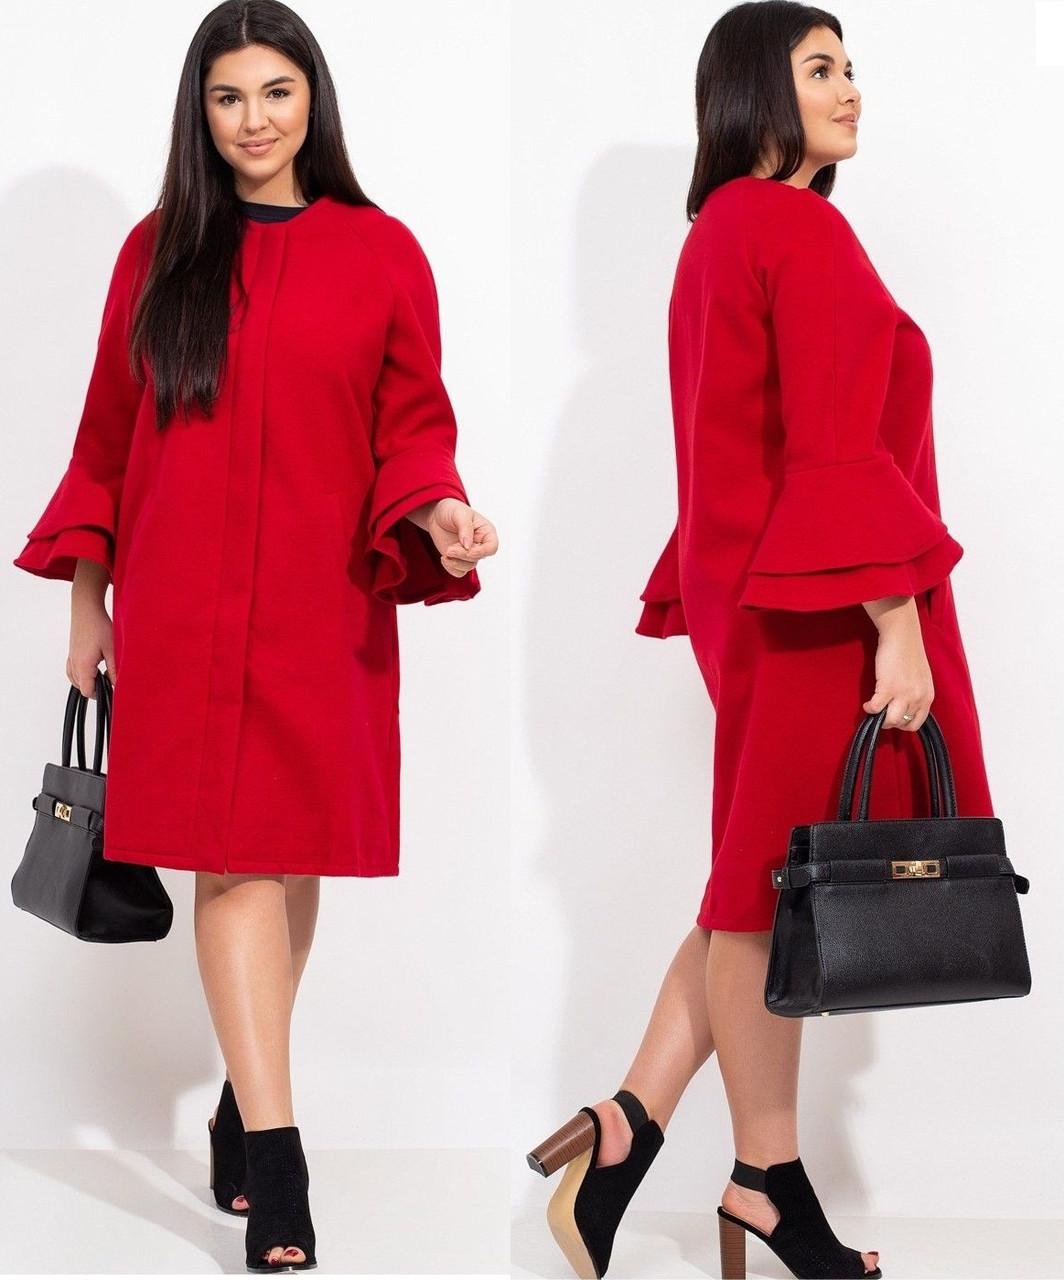 Кашемірове пальто жіноче прямого крою 46-48 50-52,54-56,58-60